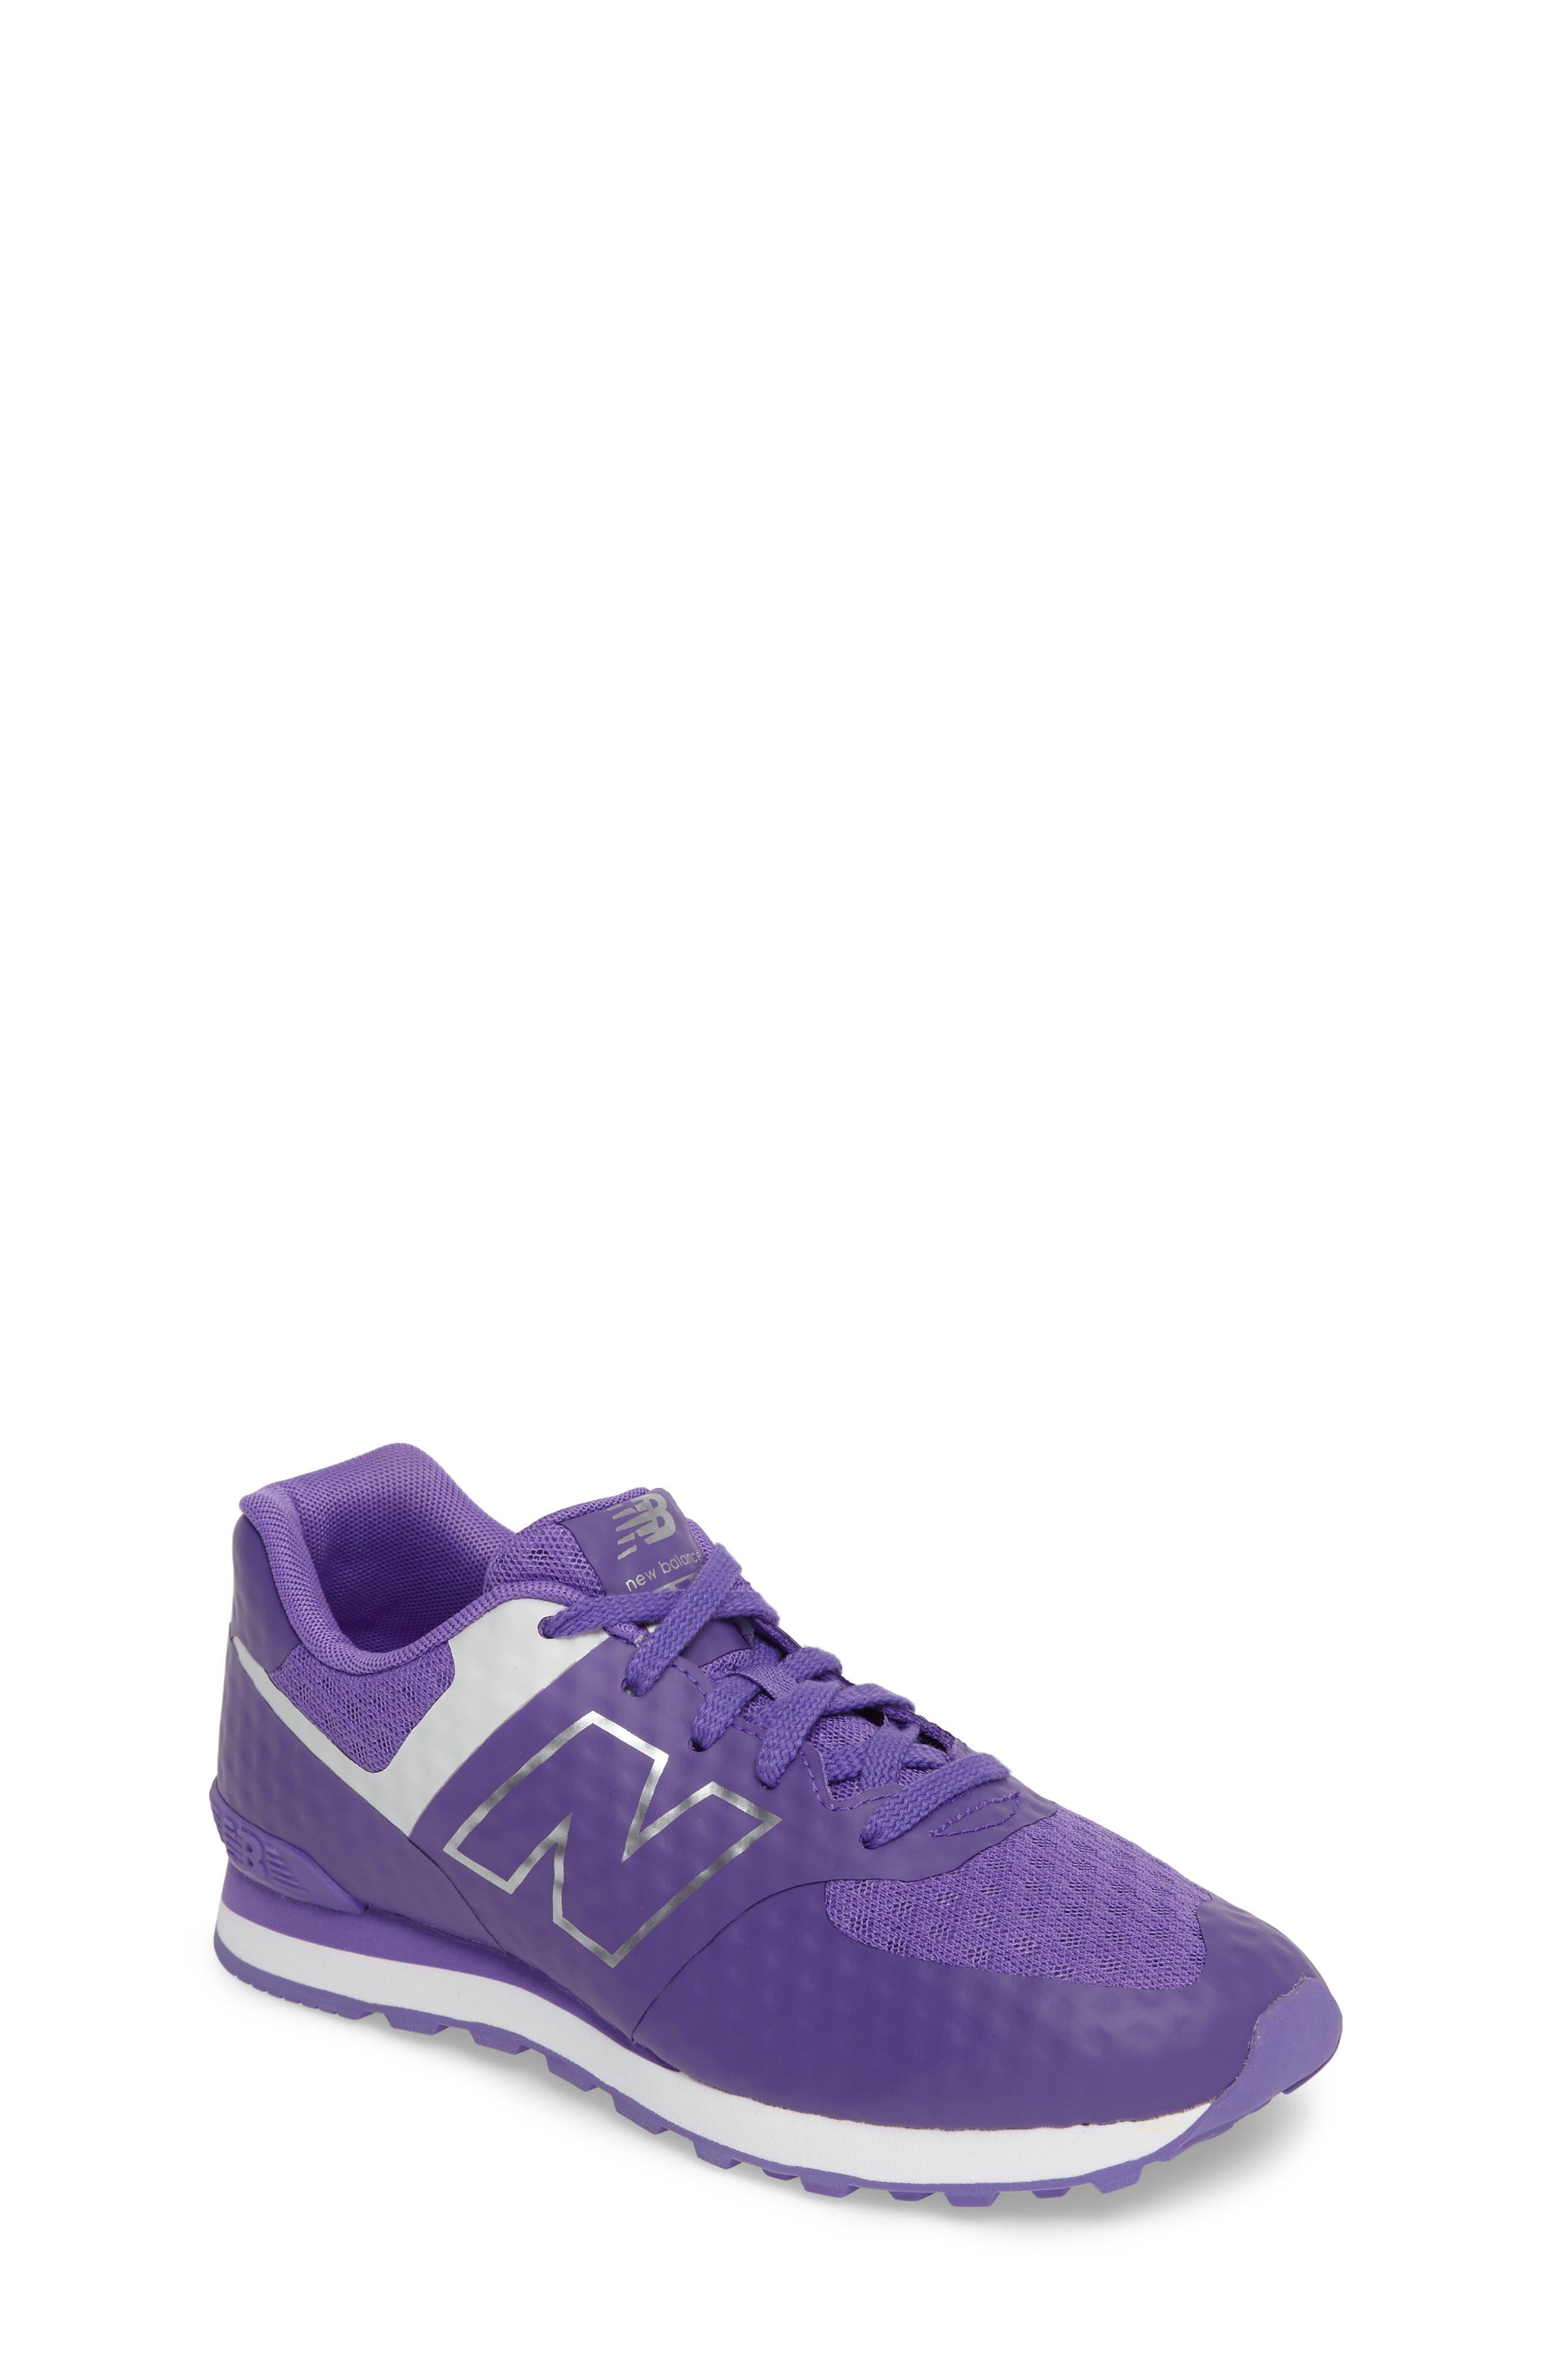 NEW BALANCE 574 Sneaker